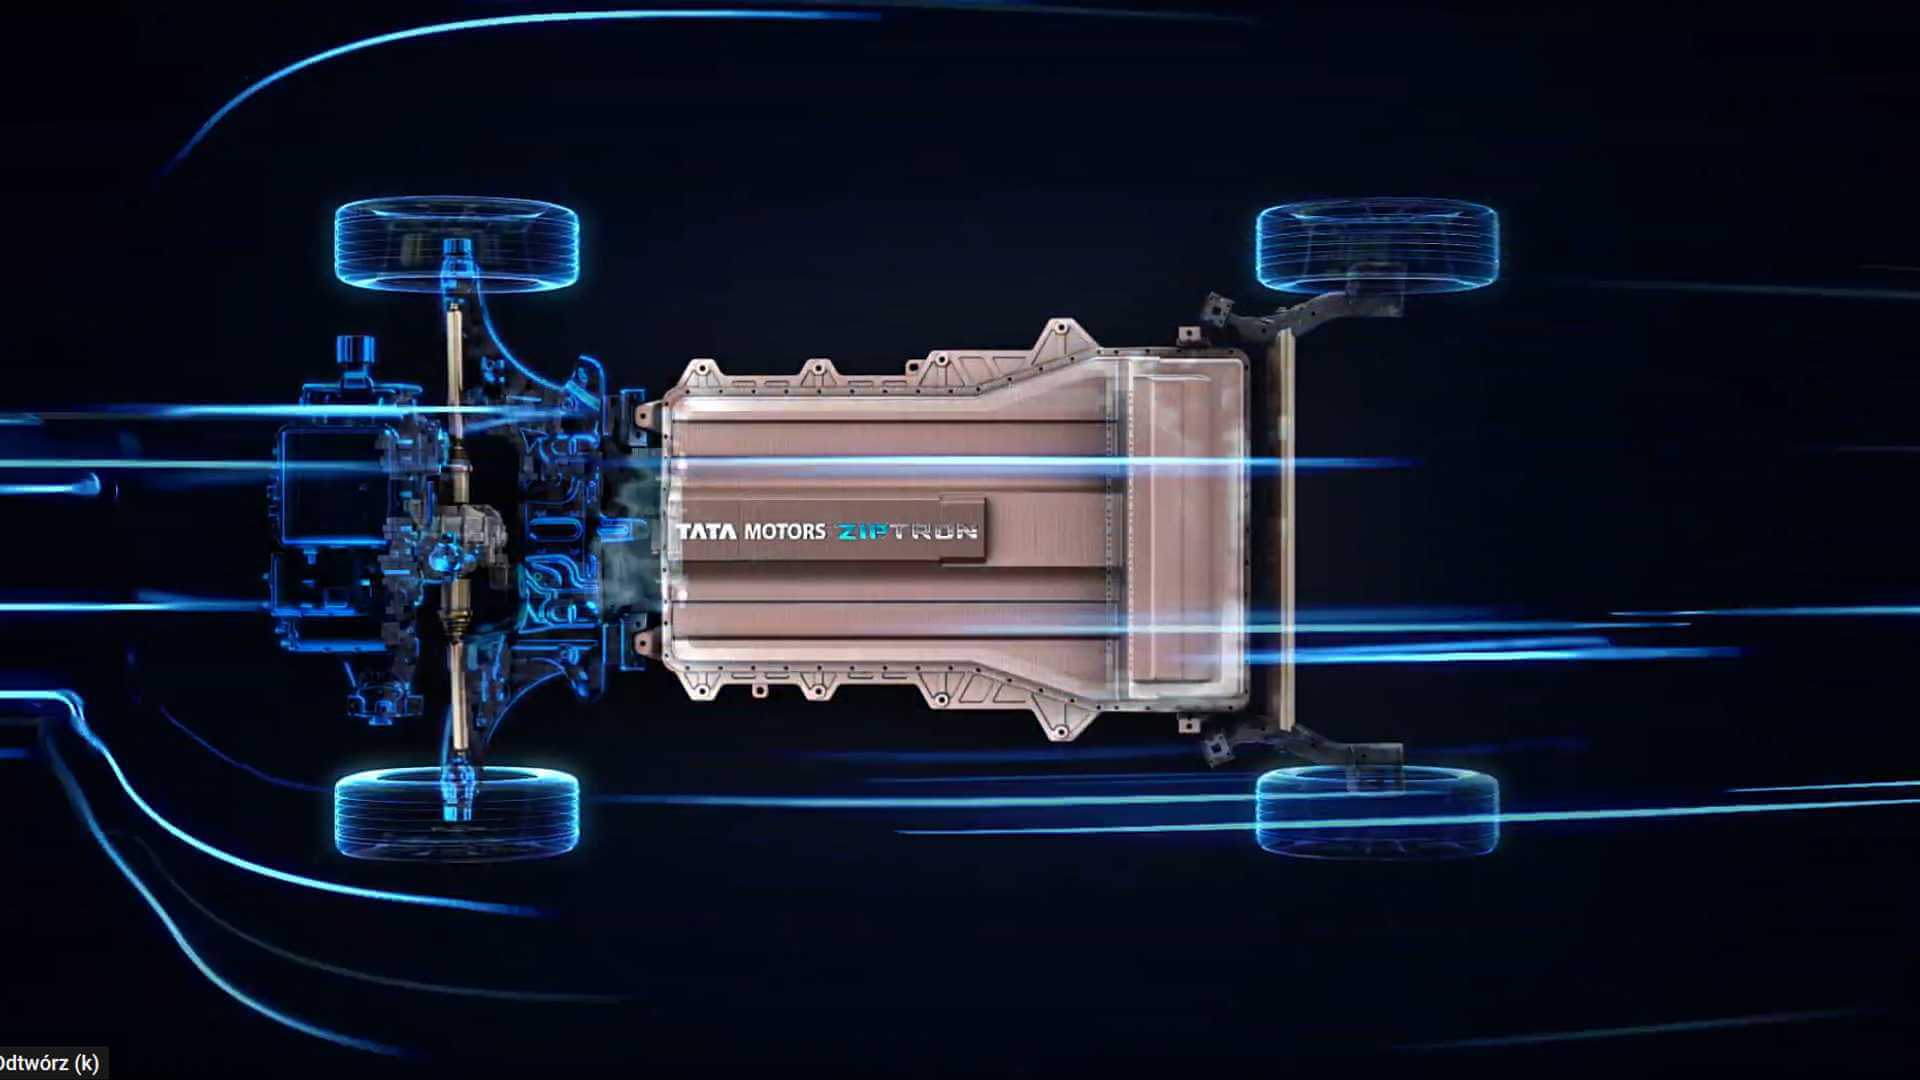 Tata Motors представила электромобильную платформу ZIPTRON